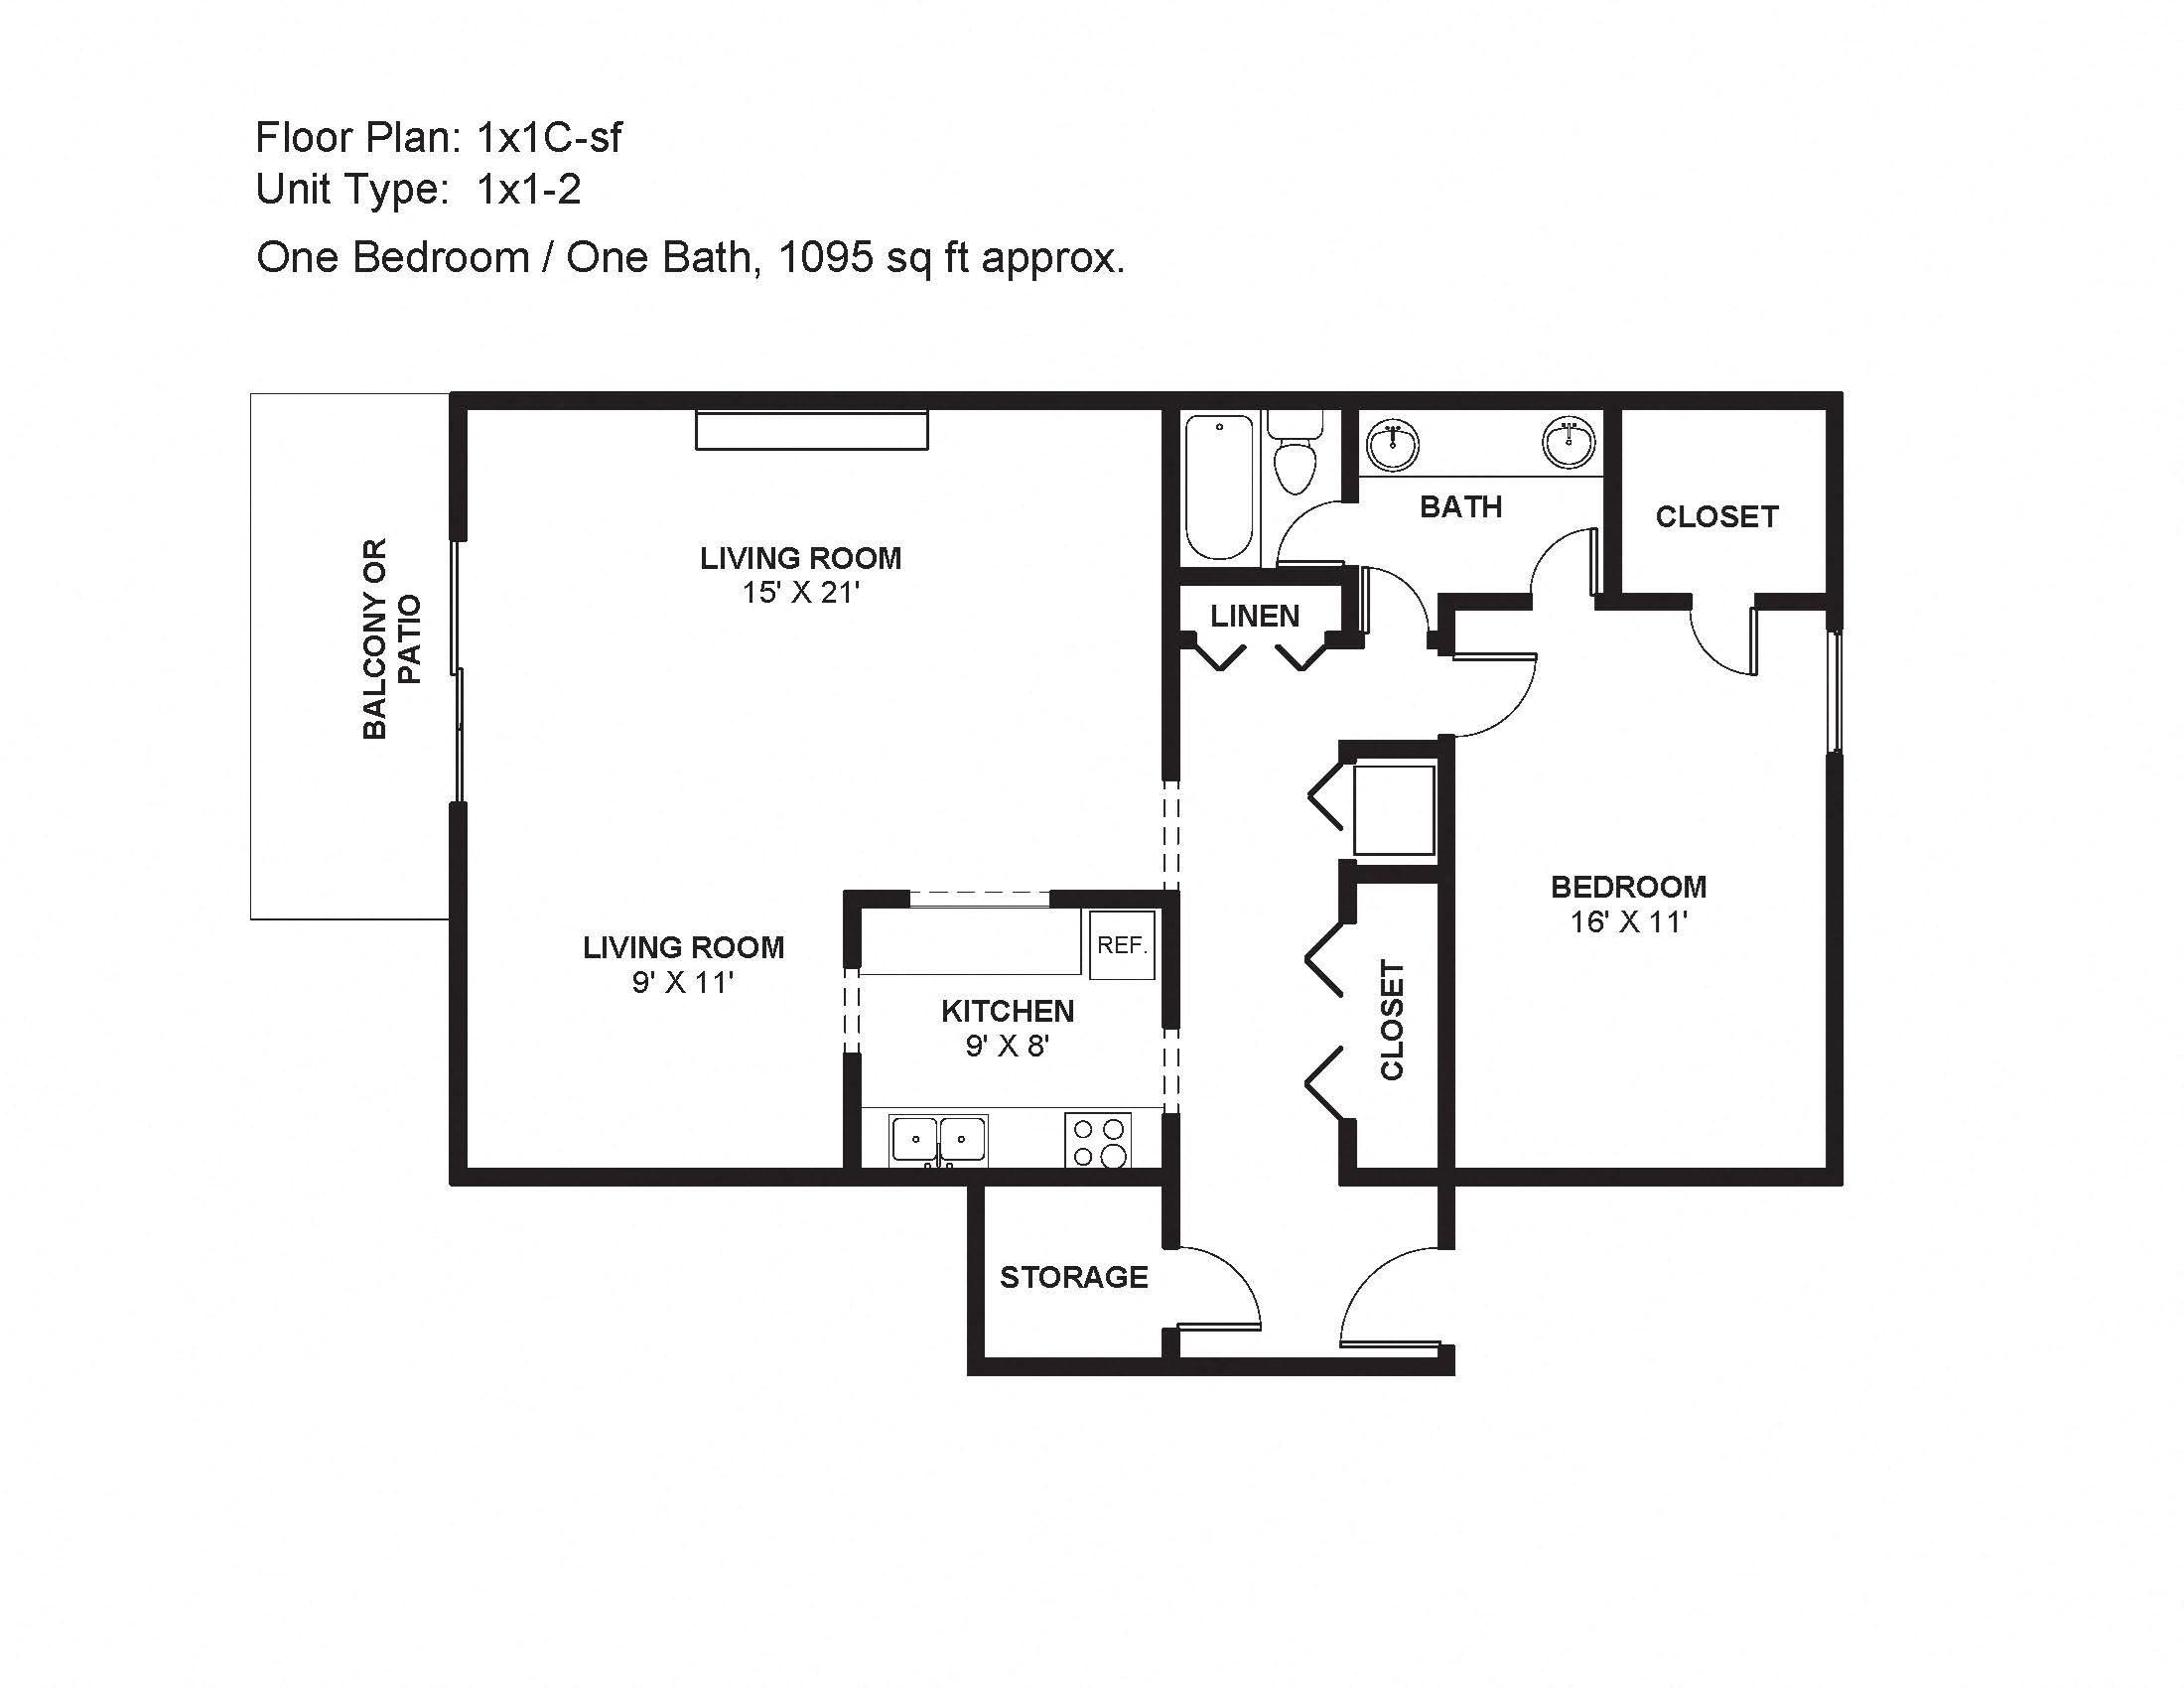 1x1C-sf Floor Plan 6